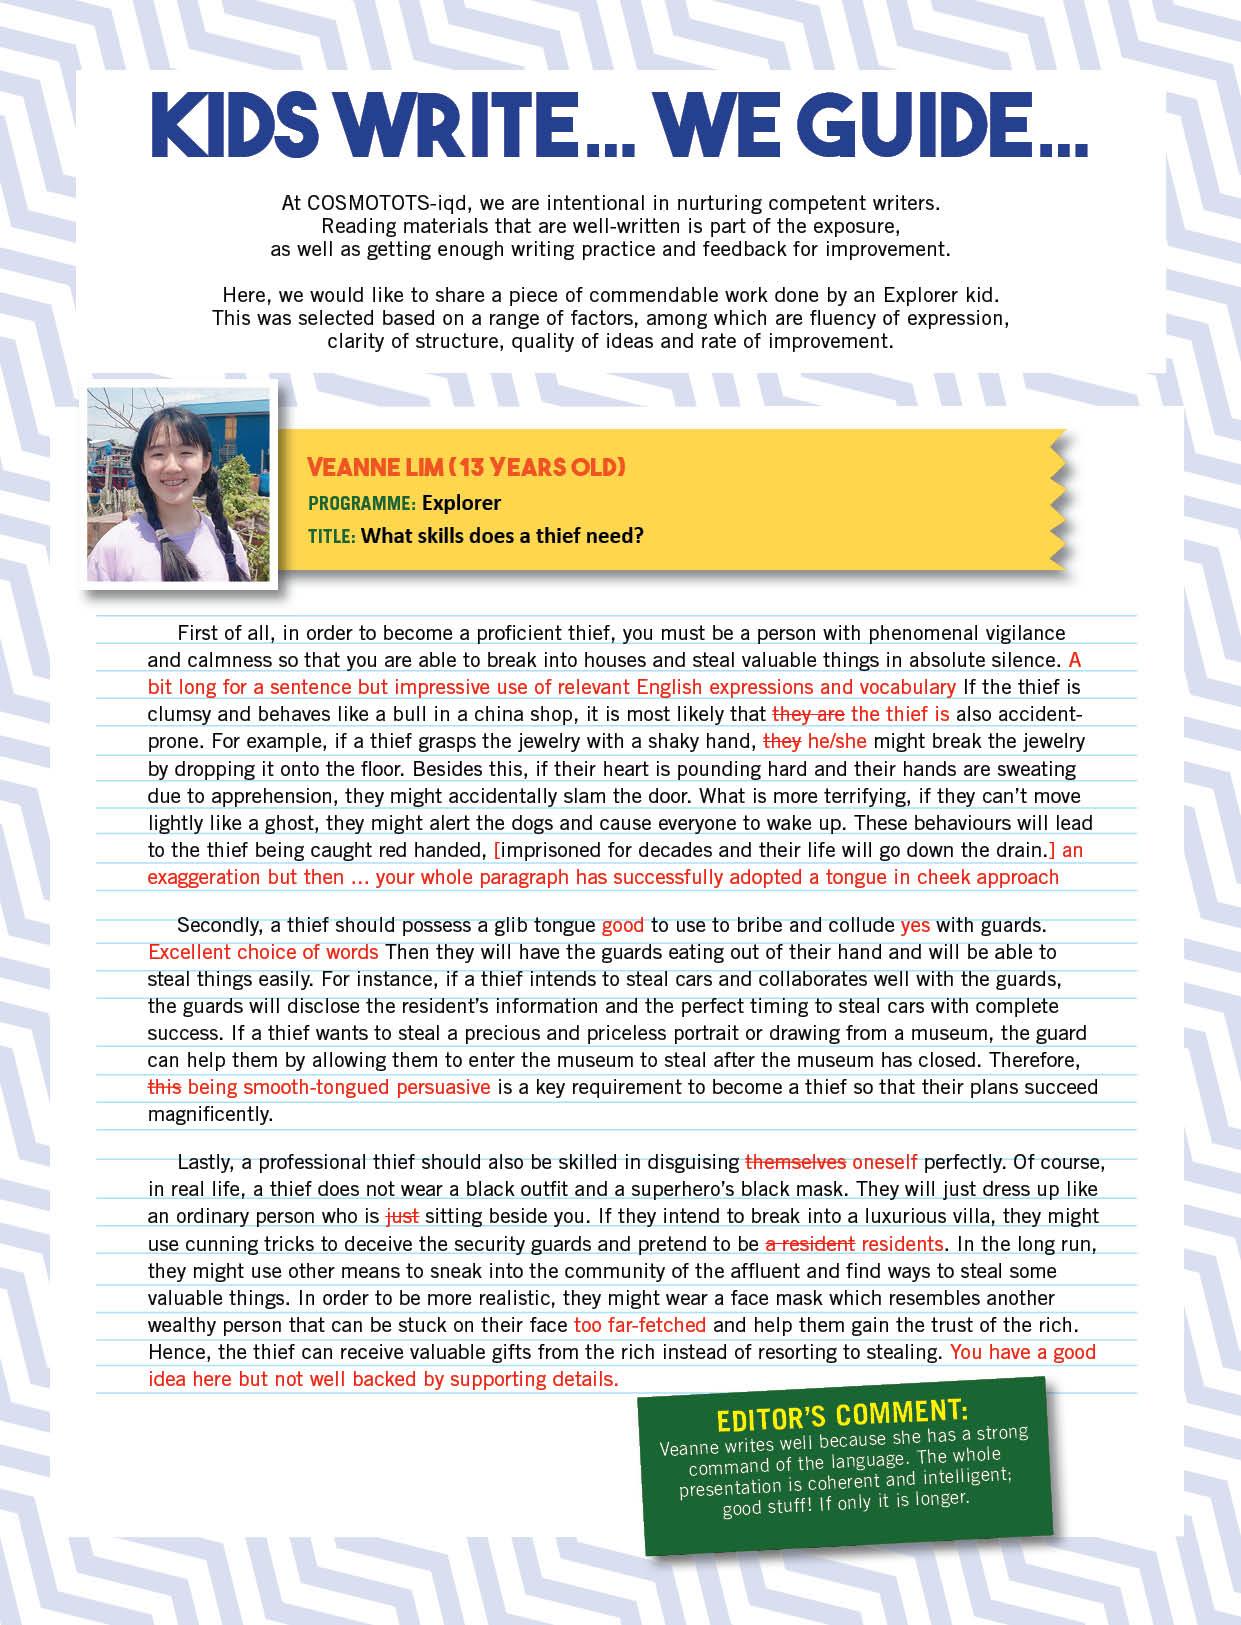 KidsWriteWeGuide-Veanne Lim-FINAL